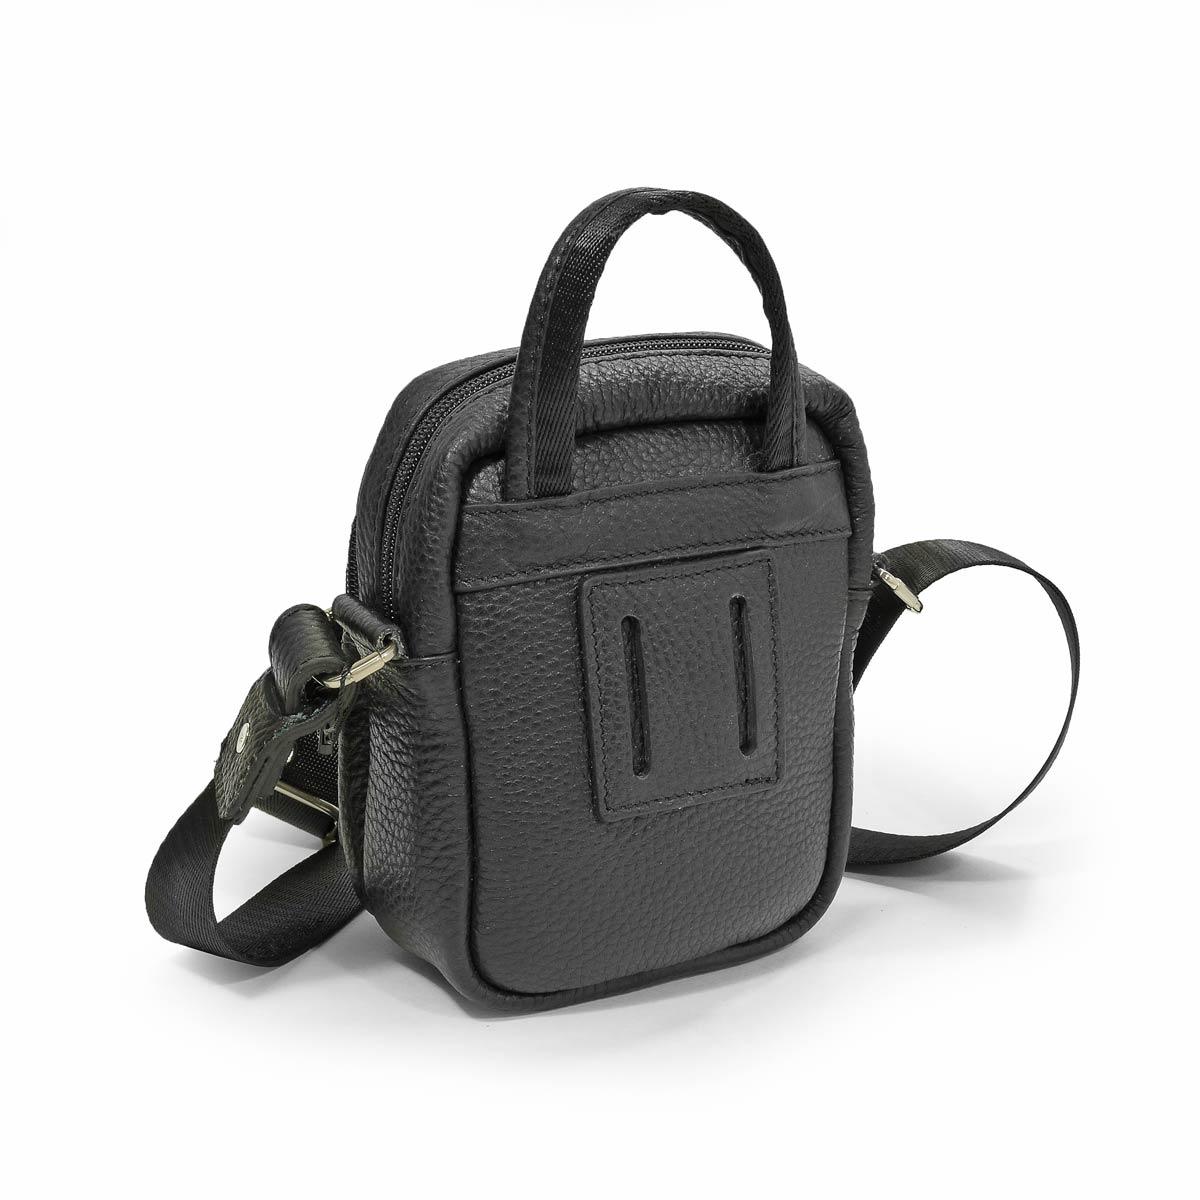 102-801-1 Men's Bag Pellekon